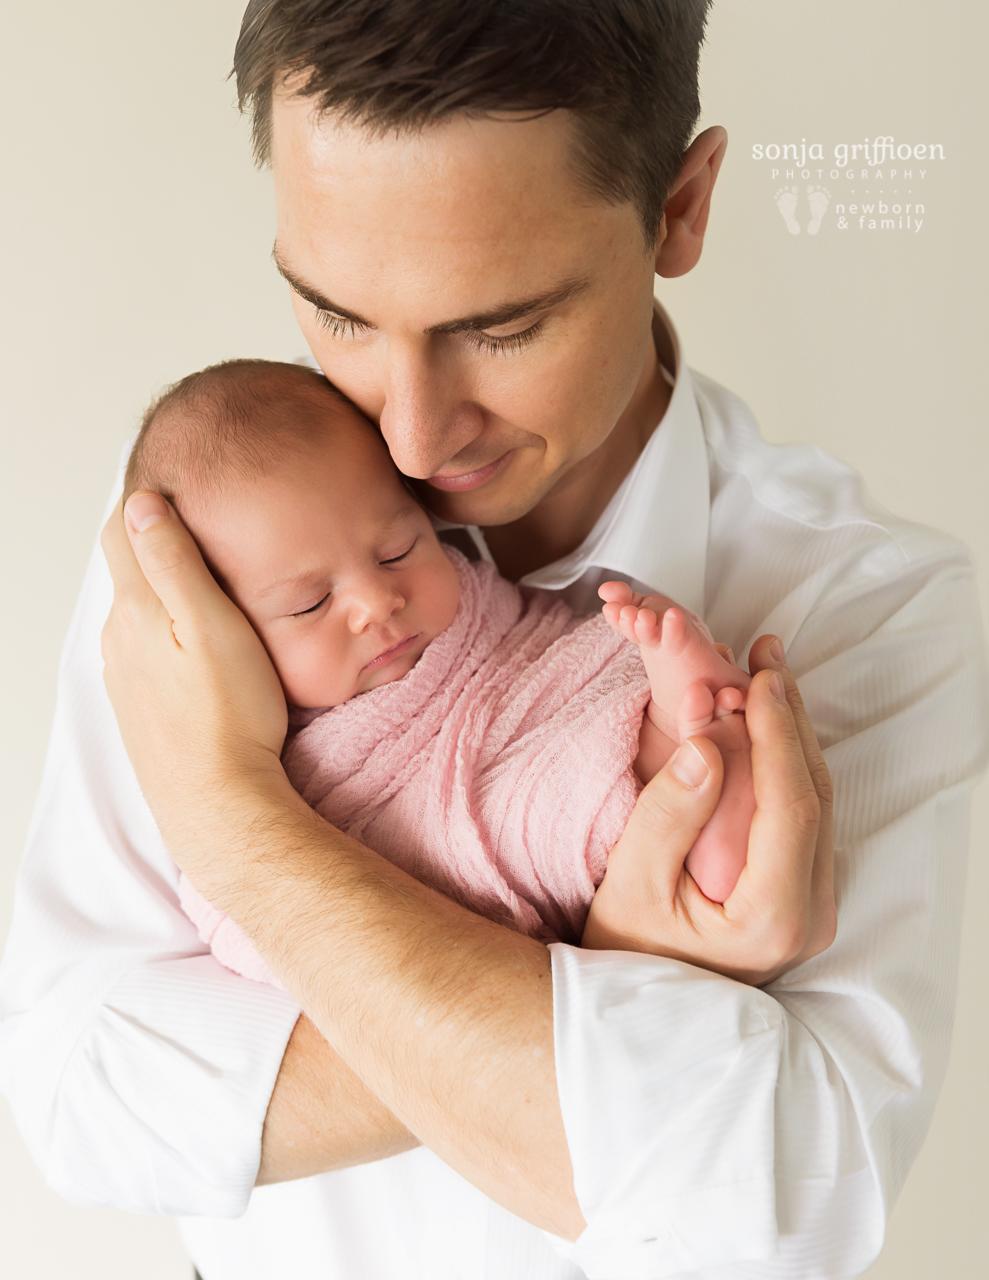 Thalia-Newborn-Brisbane-Newborn-Photographer-Sonja-Griffioen-38.jpg